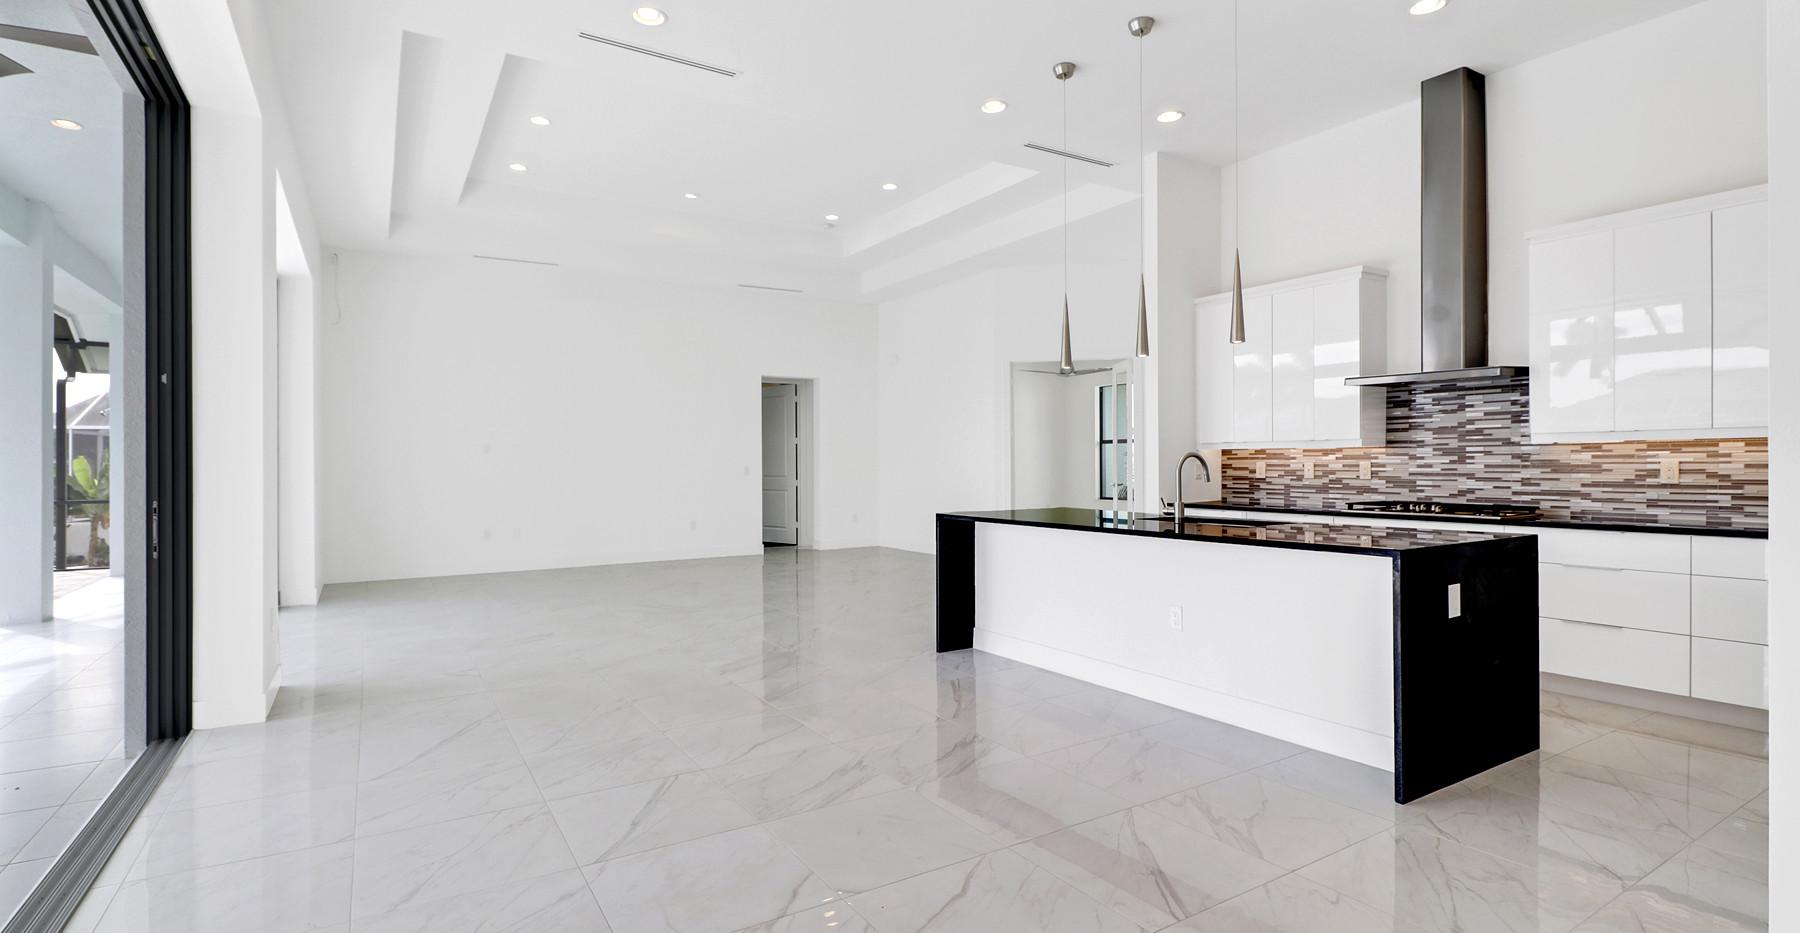 Jamaica Court home in Marco island Interior Kitchen / Living Area